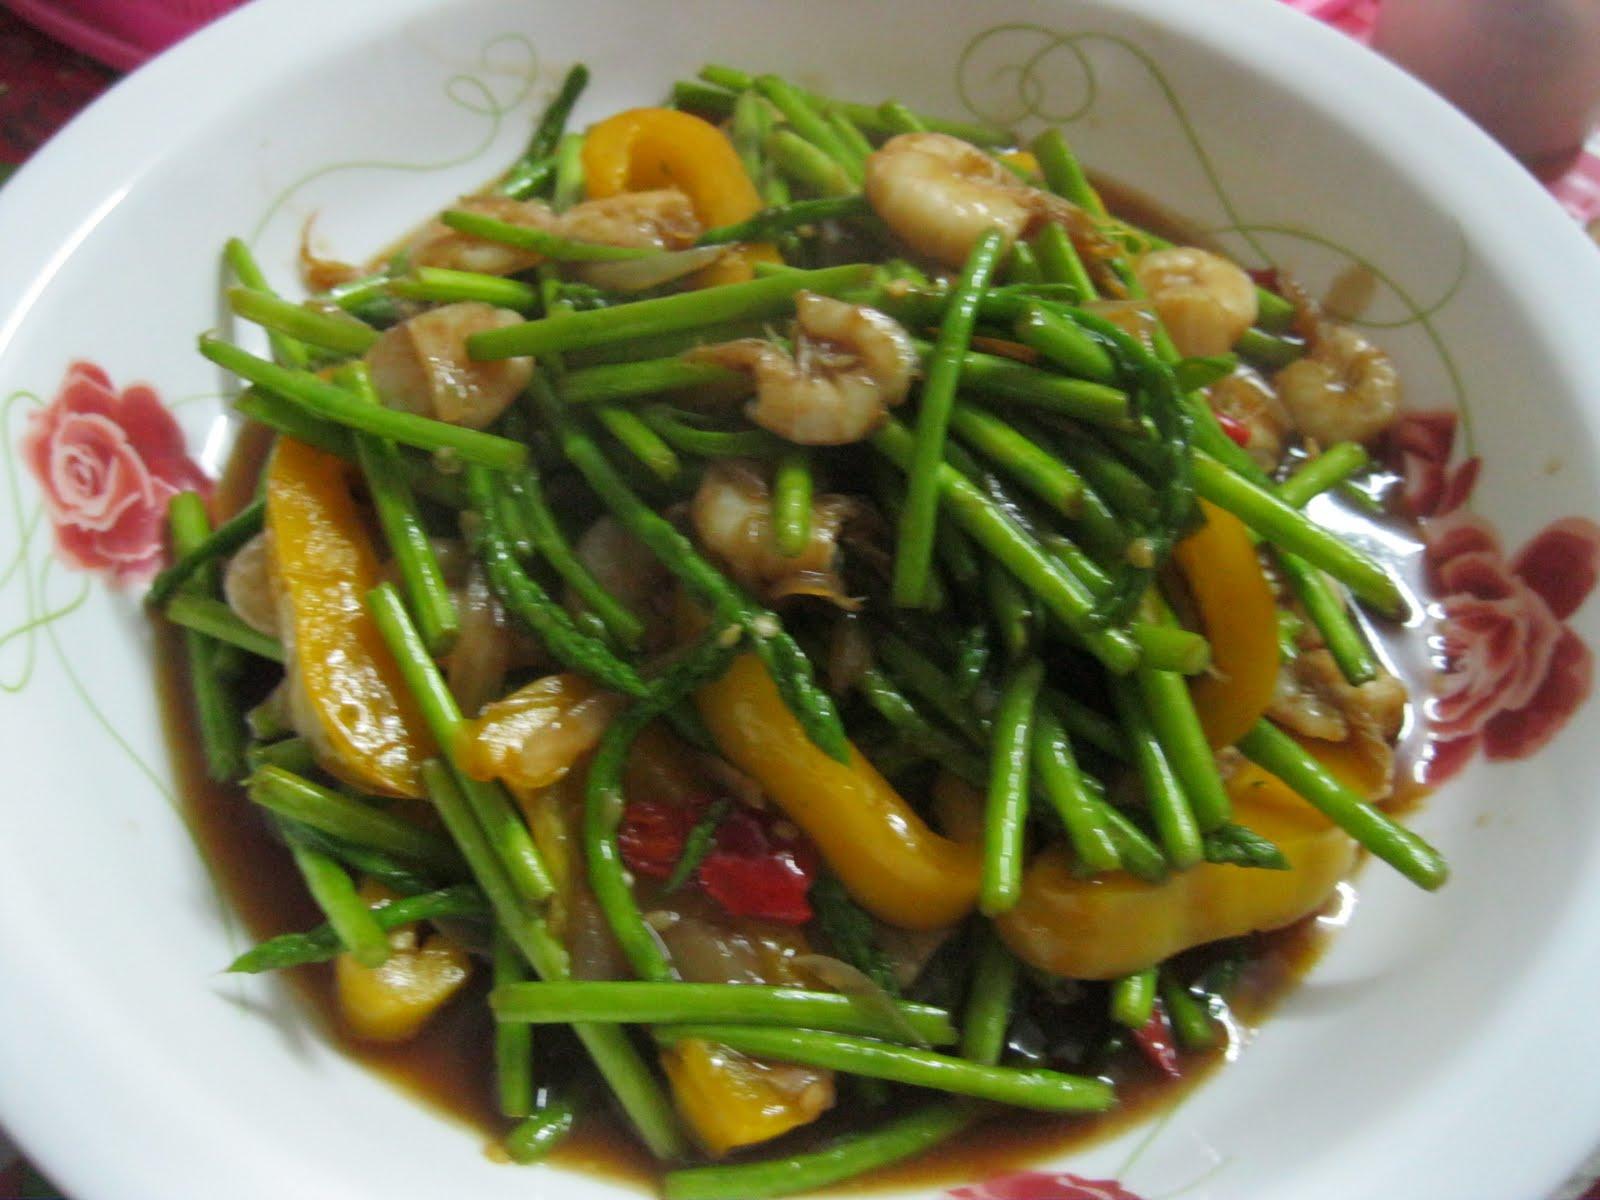 Dari Dapur Maklong: Asparagus Goreng Bersos Tiram